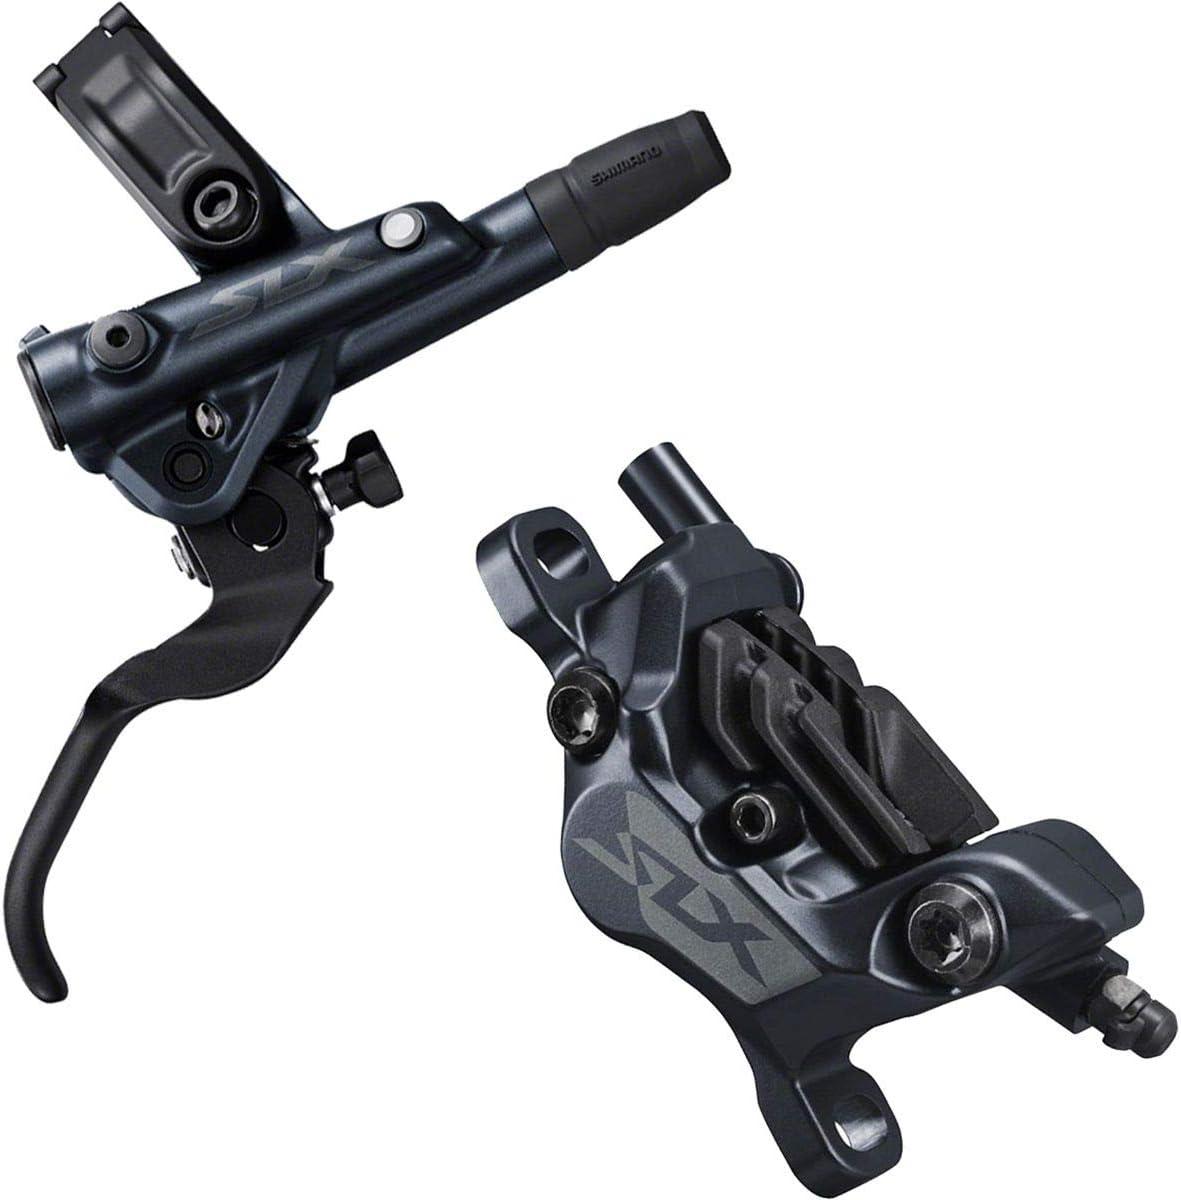 Black SHIMANO SLX M7100 M7120 Disc Brake and Lever Post Mount Hydraulic 2-Piston